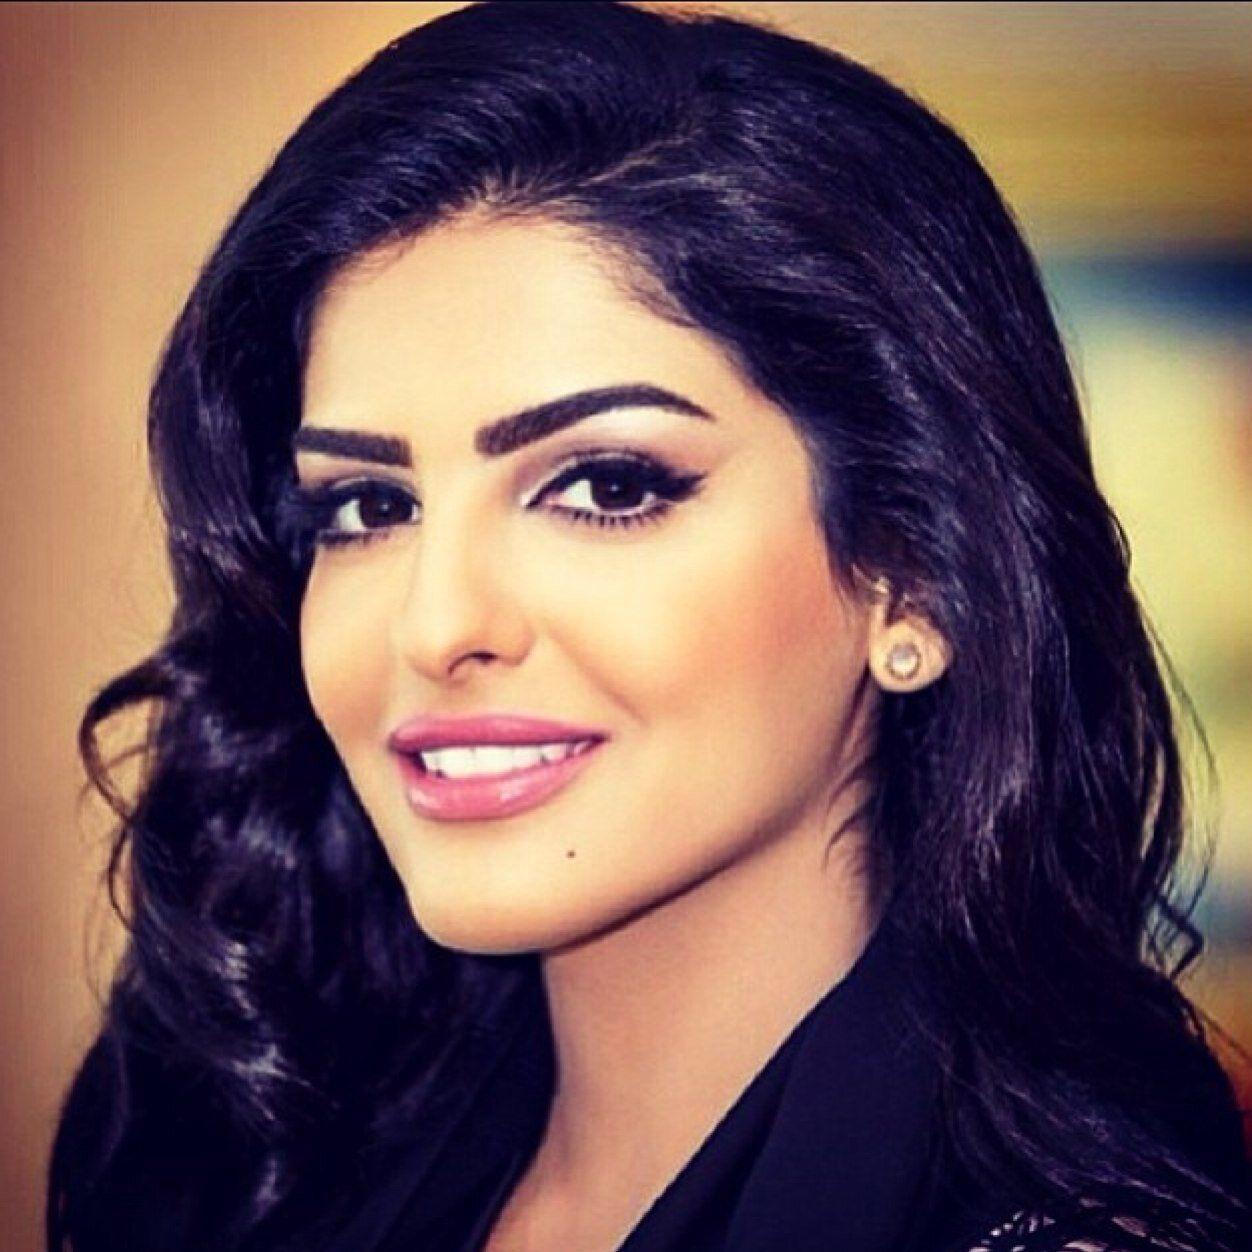 Arab amira girl dubai